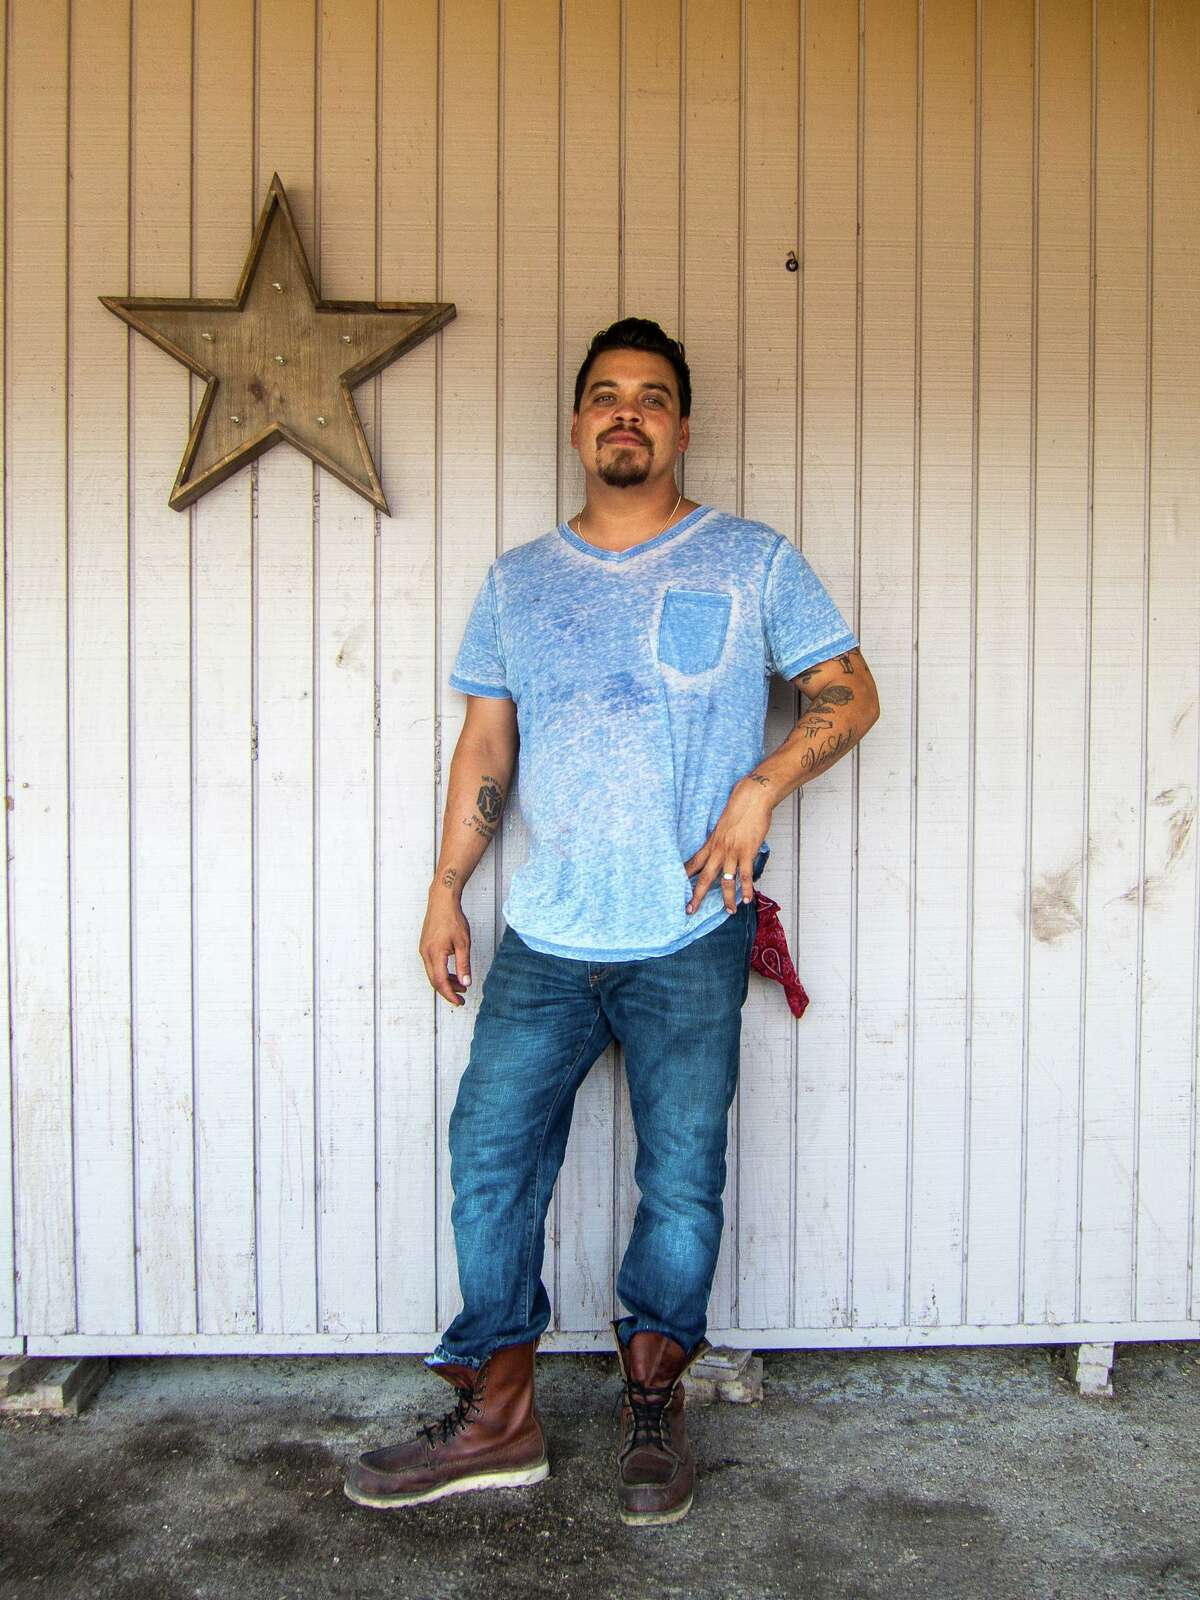 Pitmaster Miguel Vidal of Valentina's Tex-Mex